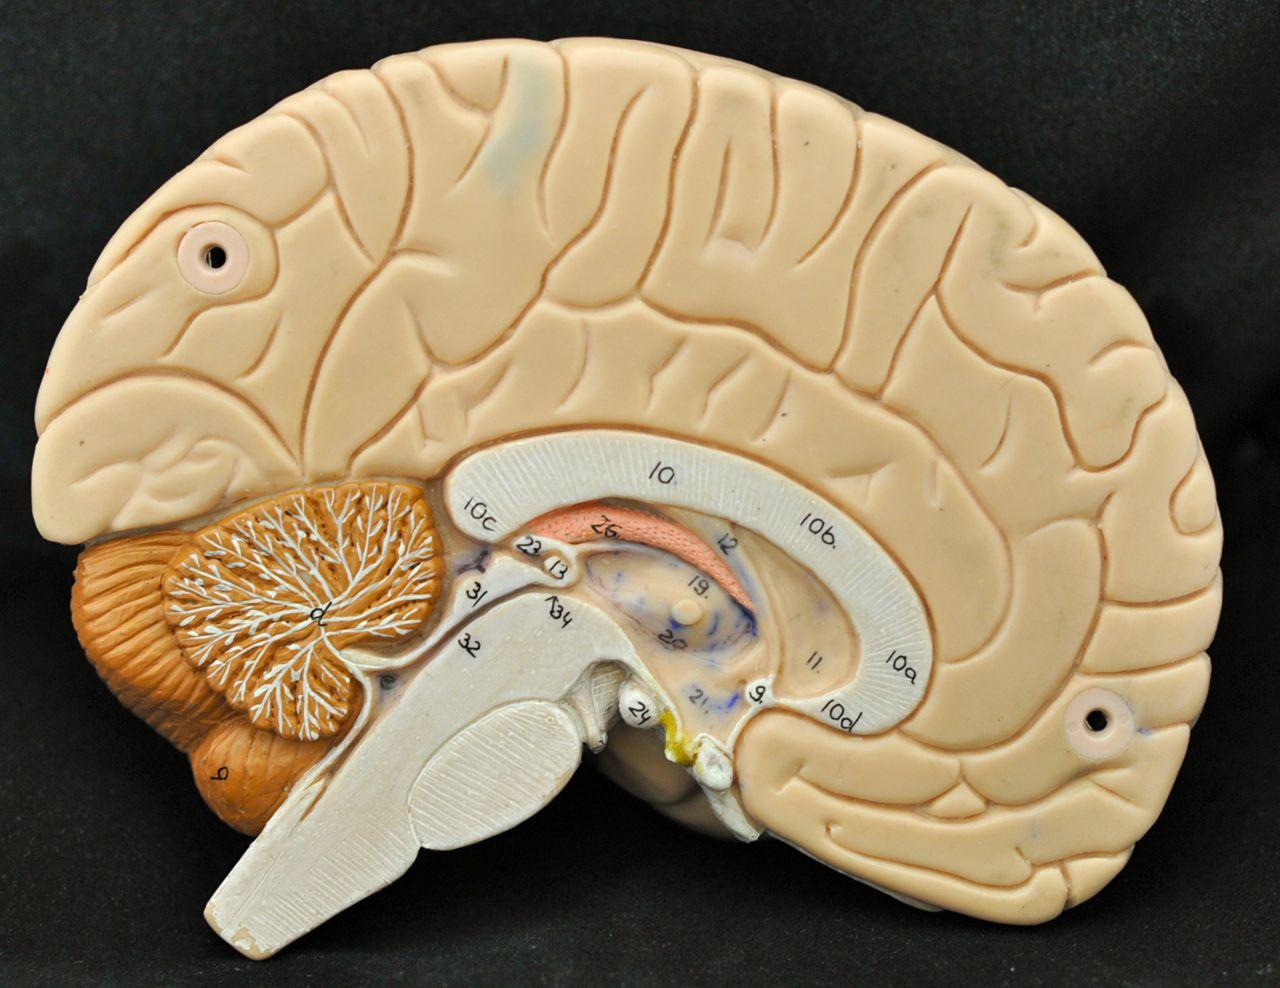 Human Anatomy Lab: Brain Models